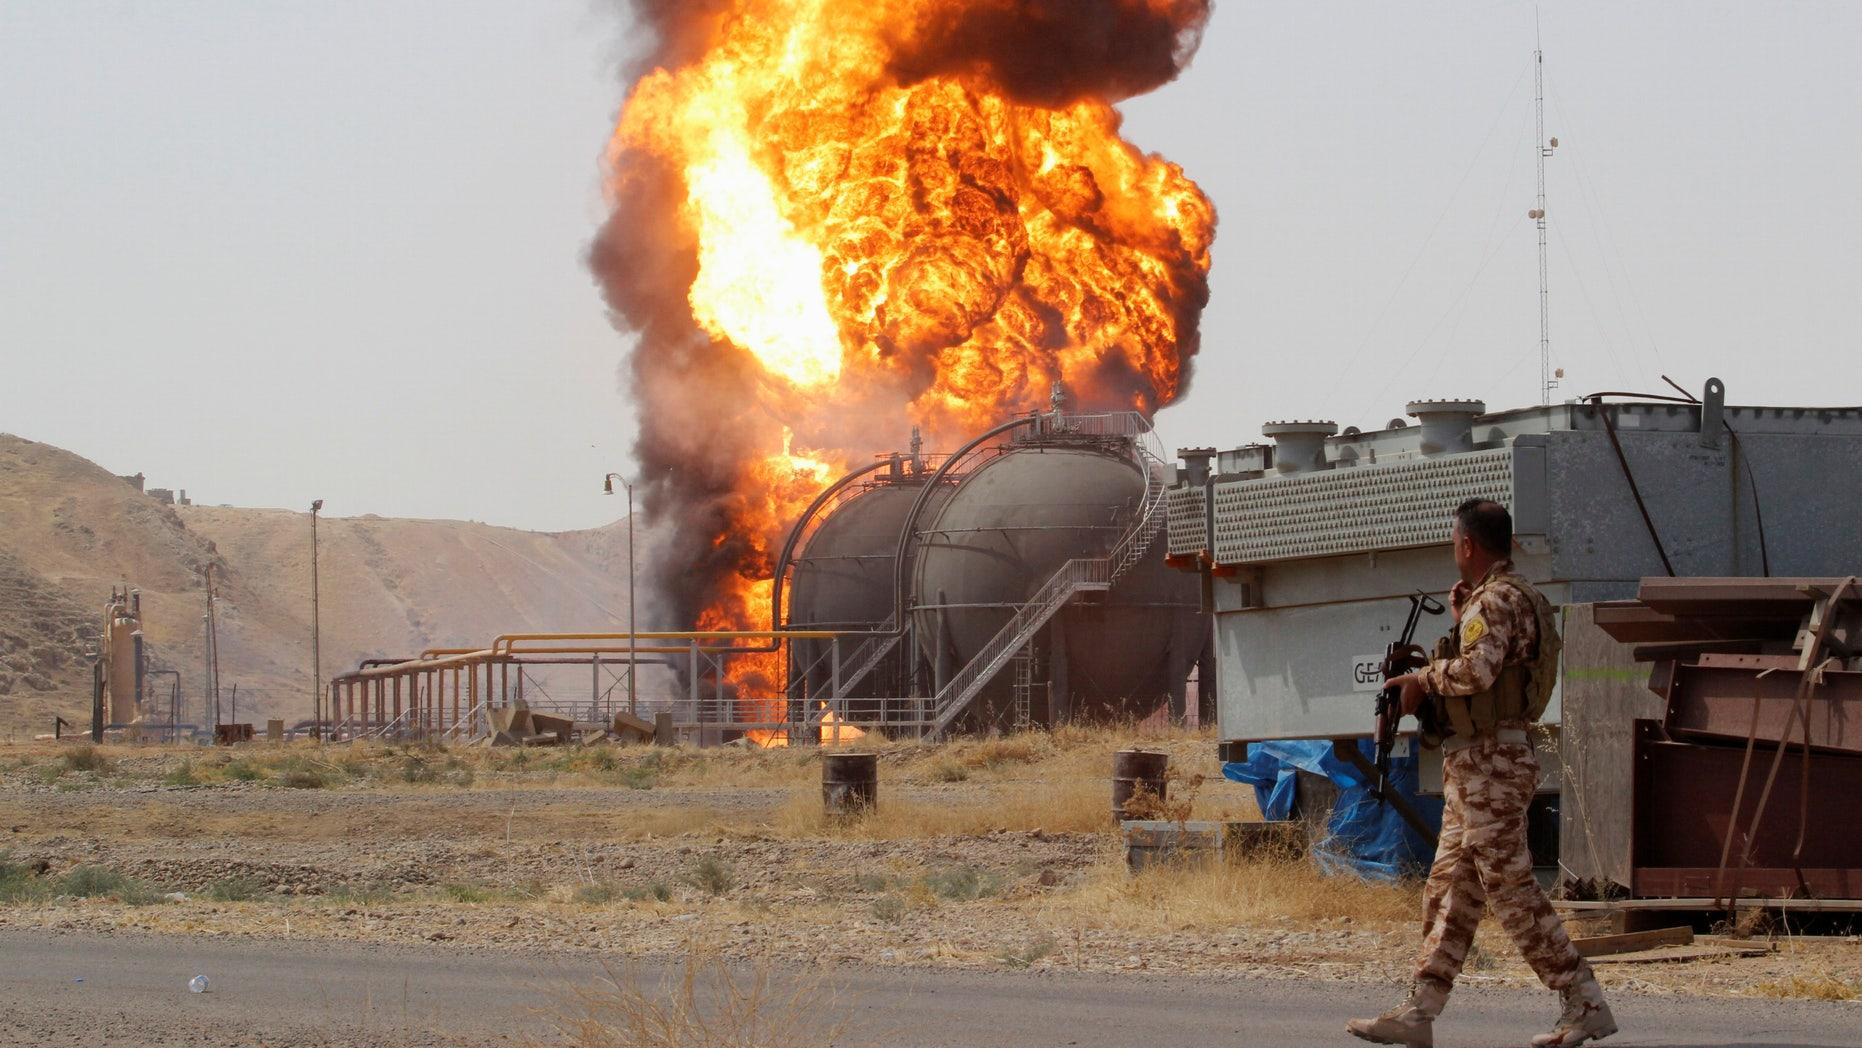 A member of the Kurdish Peshmerga forces walks as smoke rises after an attack at Bai Hassan oil station, northwest of Kirkuk, Iraq, July 31, 2016. REUTERS/Ako Rasheed - RTSKFNM